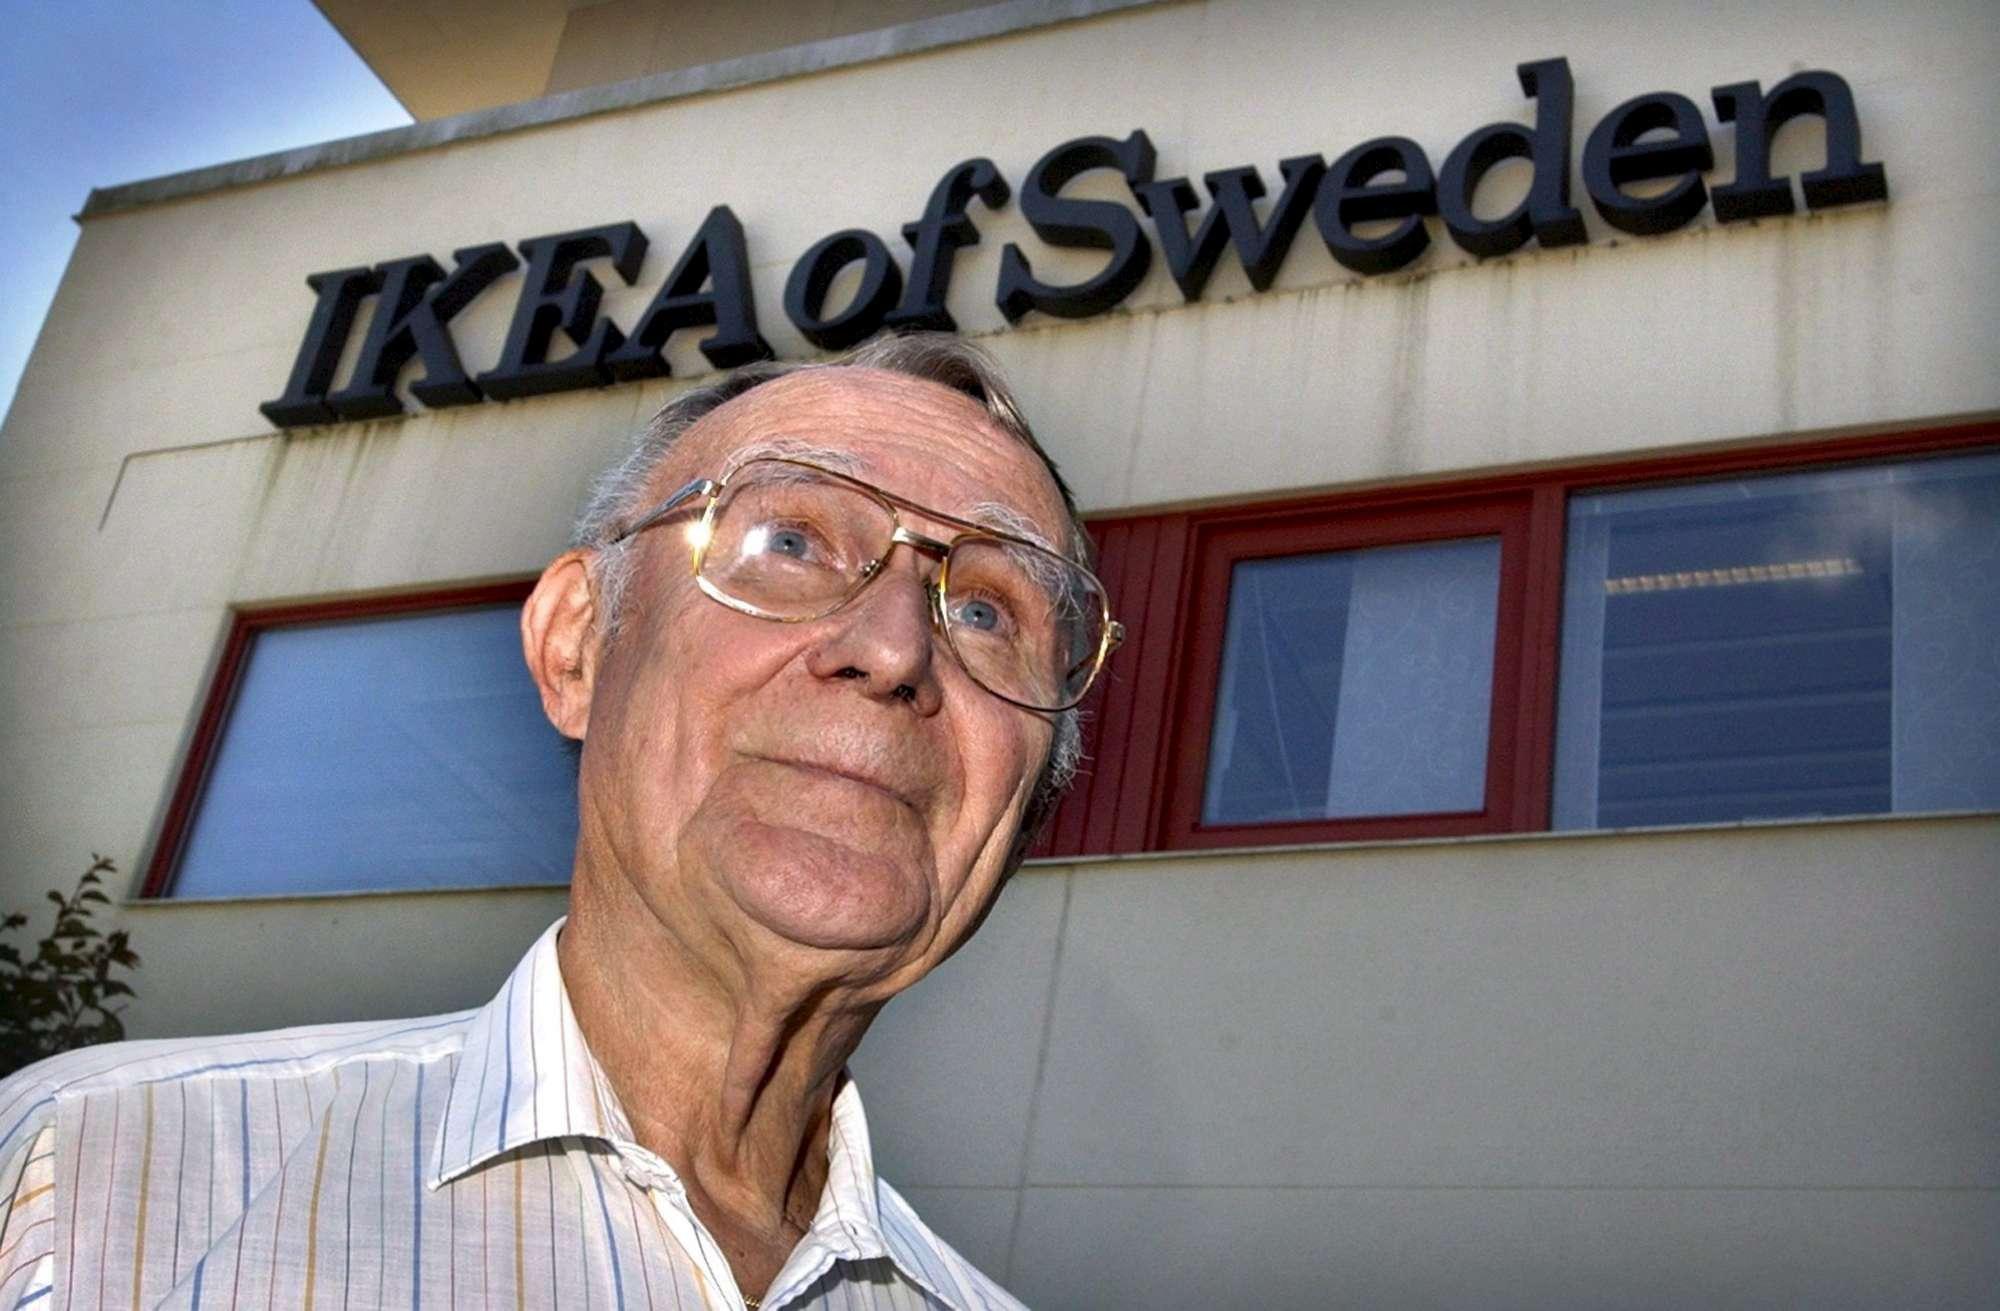 Addio al fondatore di Ikea Ingvar Kamprad